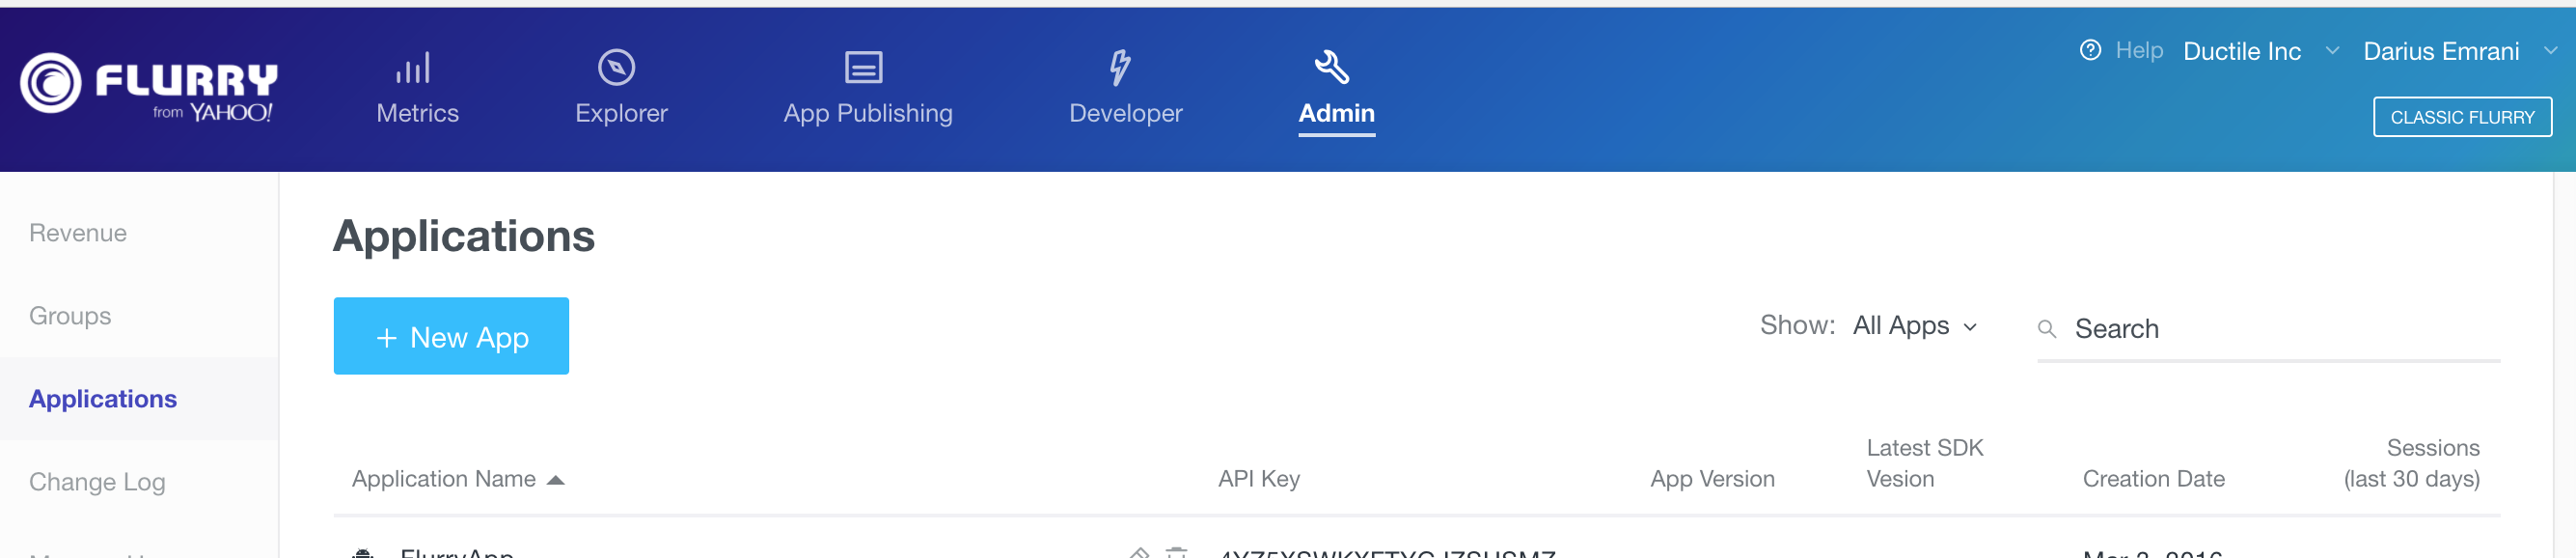 add_new_app